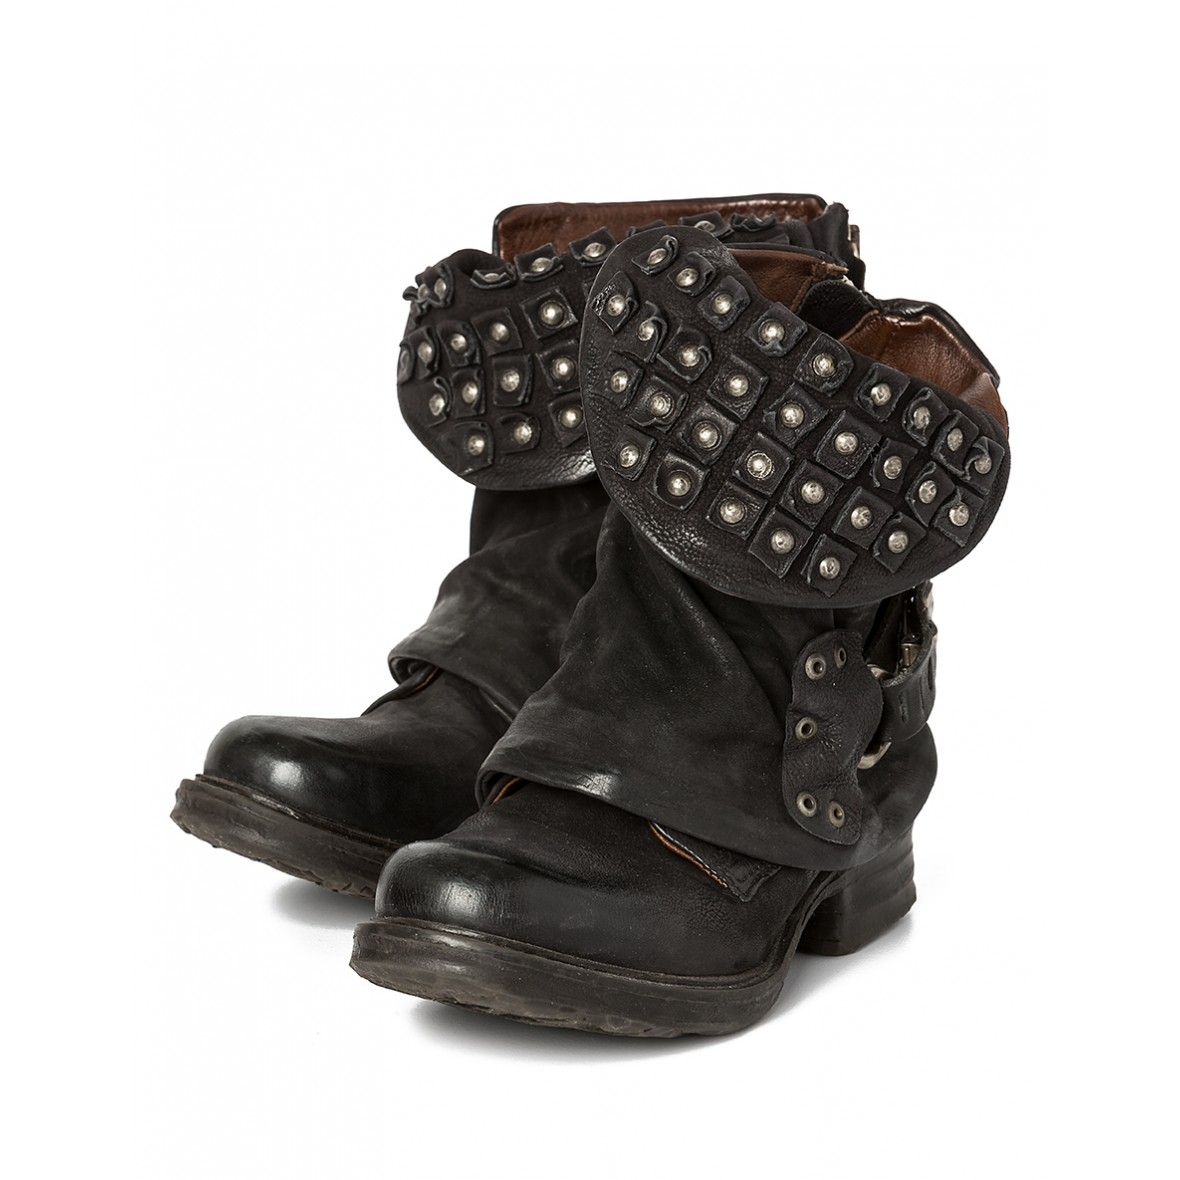 finest selection 7b445 daf5f Biker Boots